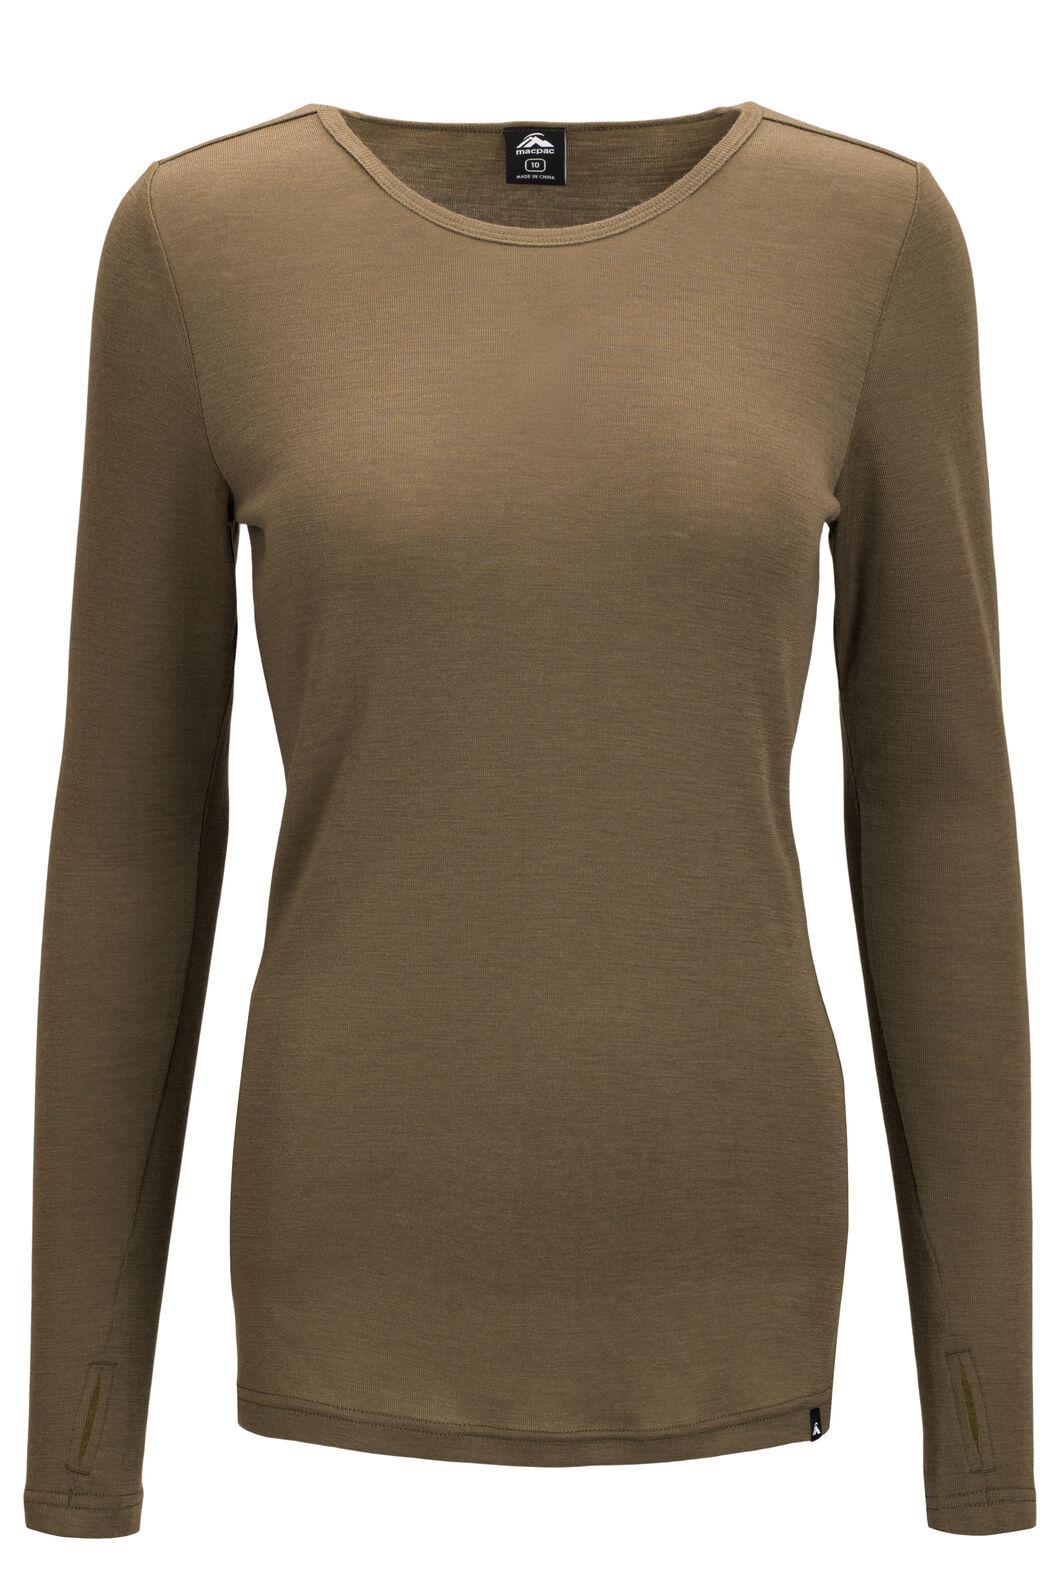 Macpac Women's 220 Merino Long Sleeve Top, Burnt Olive, hi-res